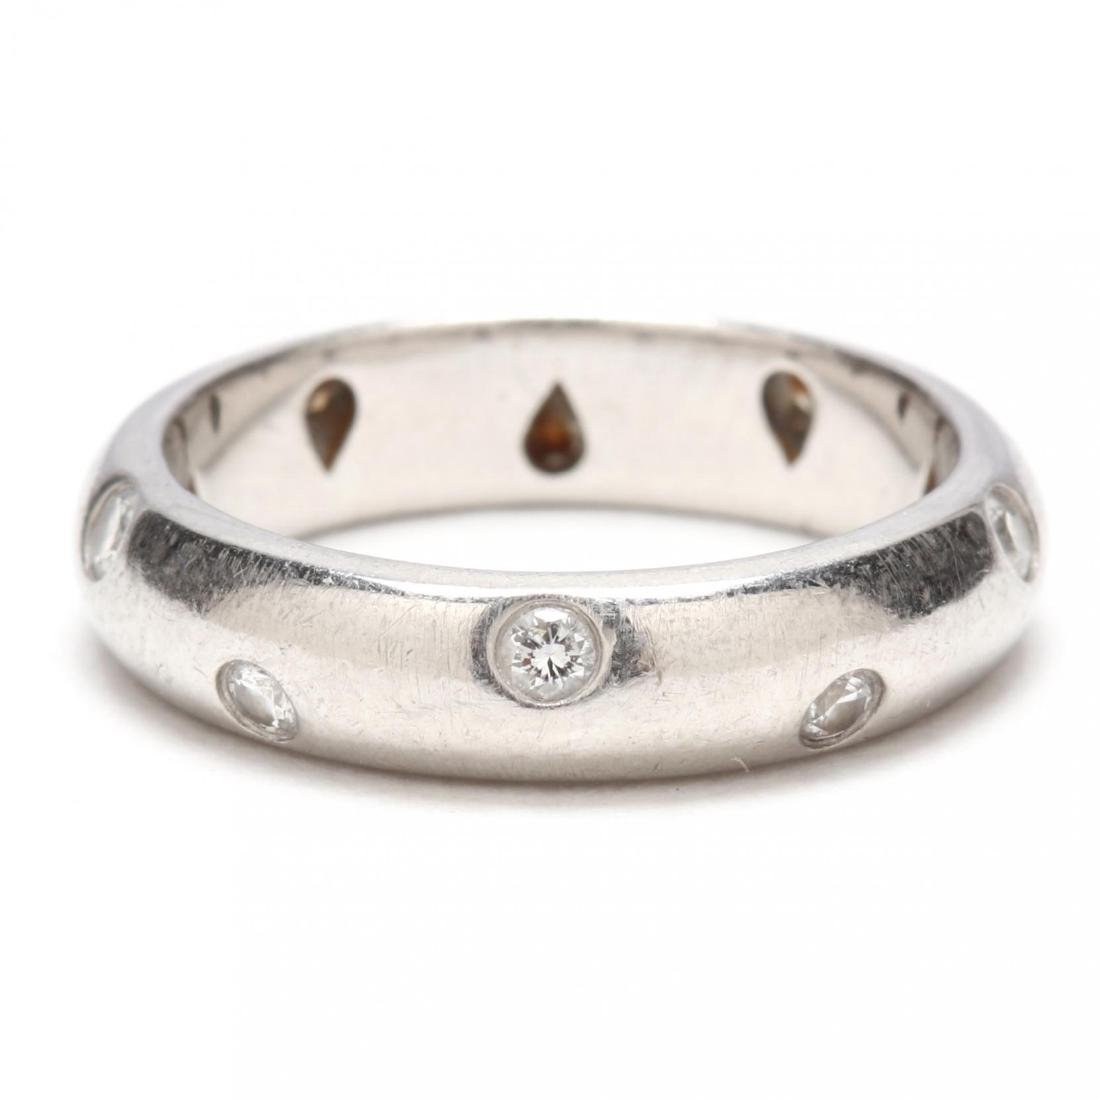 Platinum and Diamond Etoile Ring, Tiffany & Co.